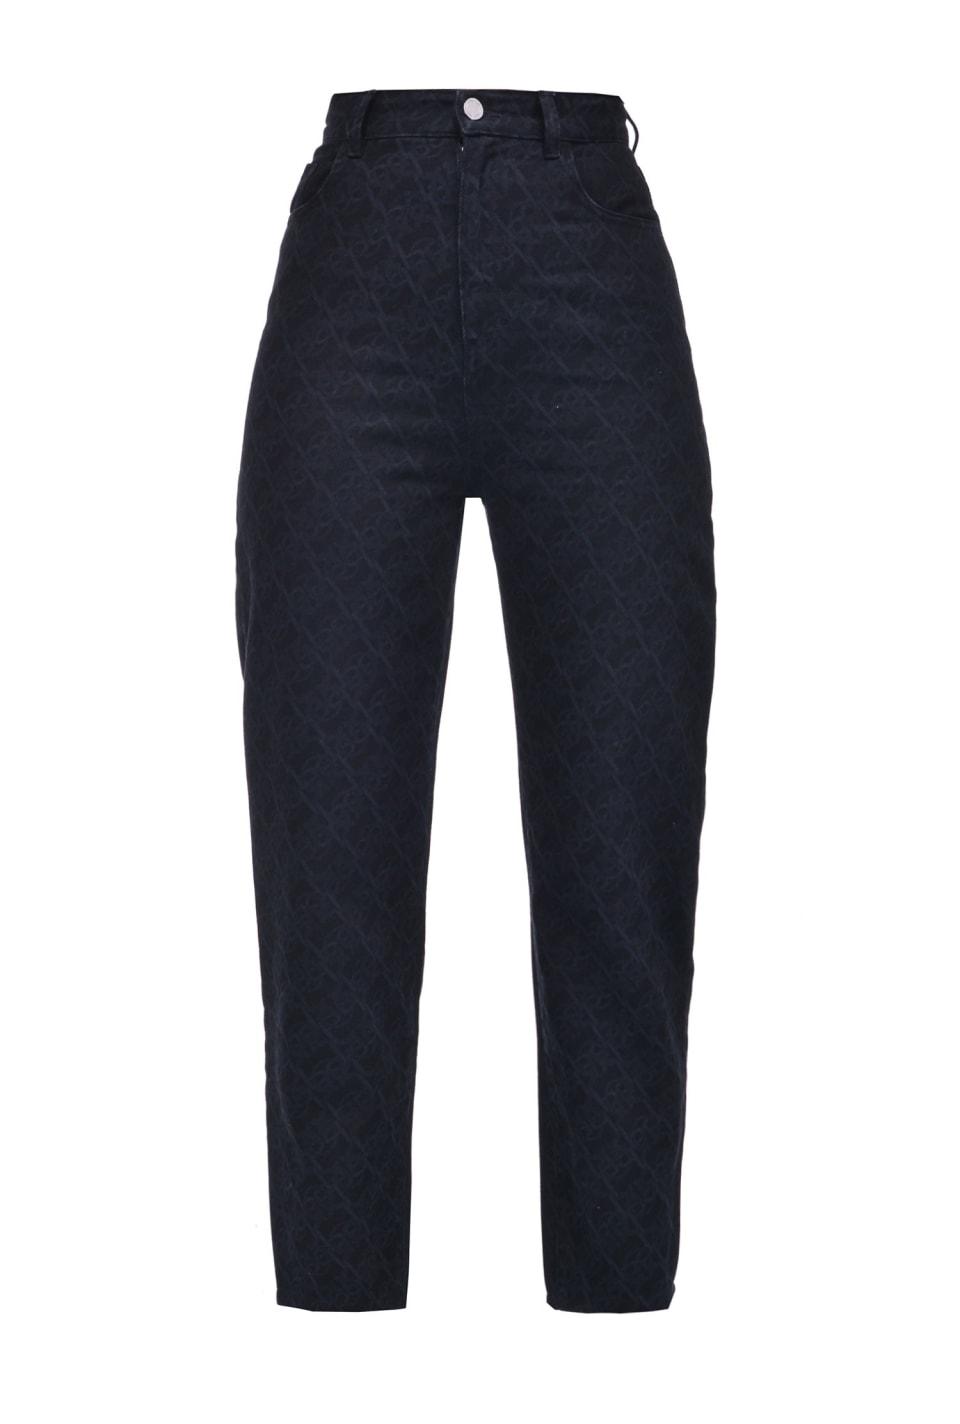 Monogram牛仔裤